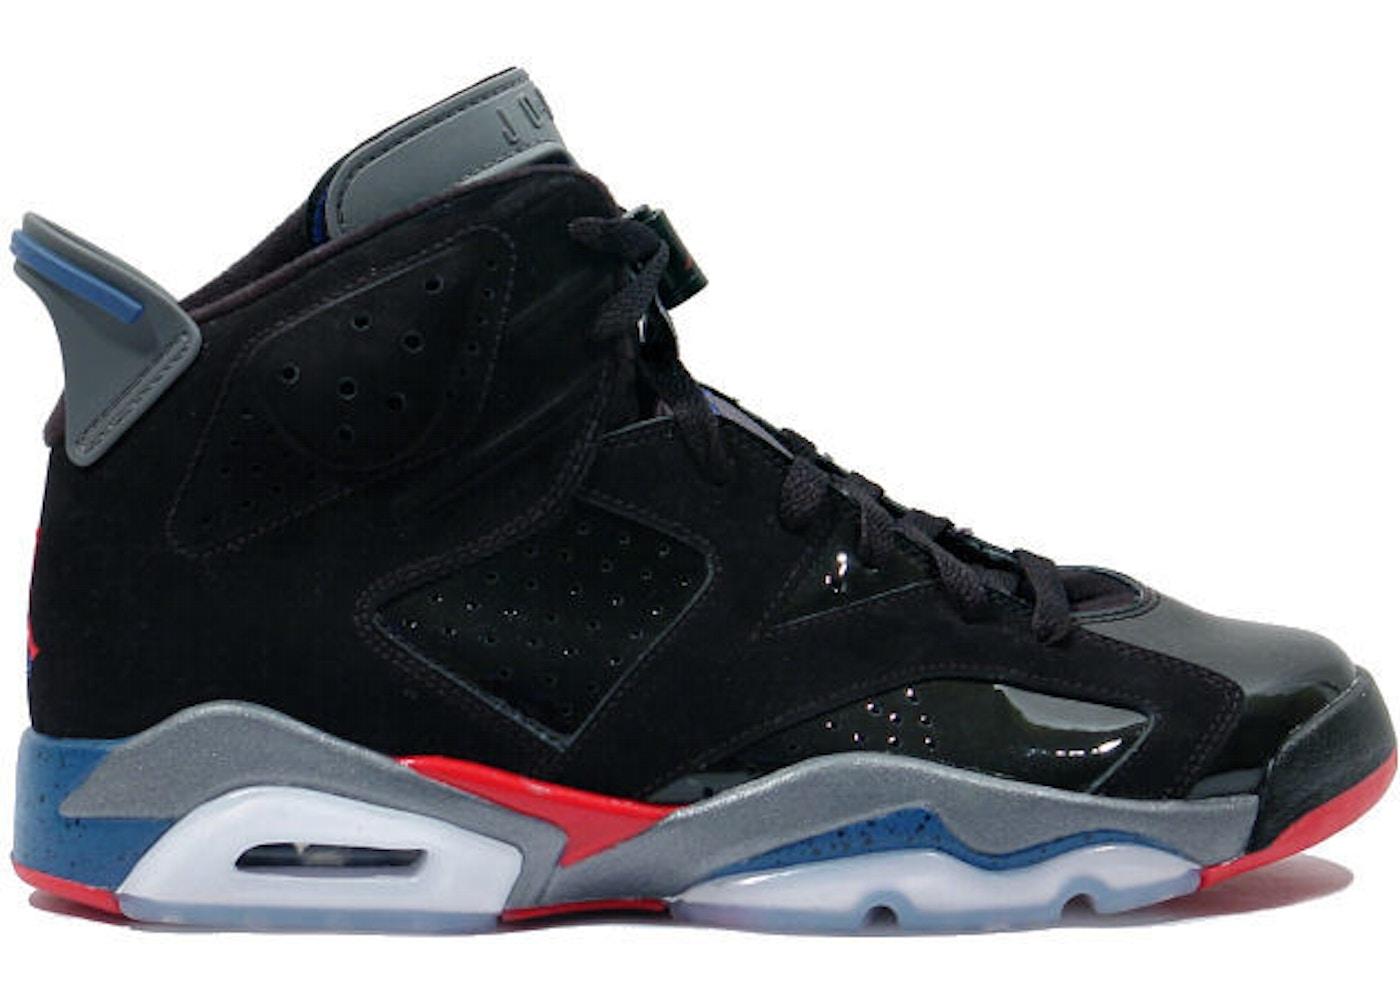 online store d615f 0860d Jordan 6 Retro Pistons - 384664-001